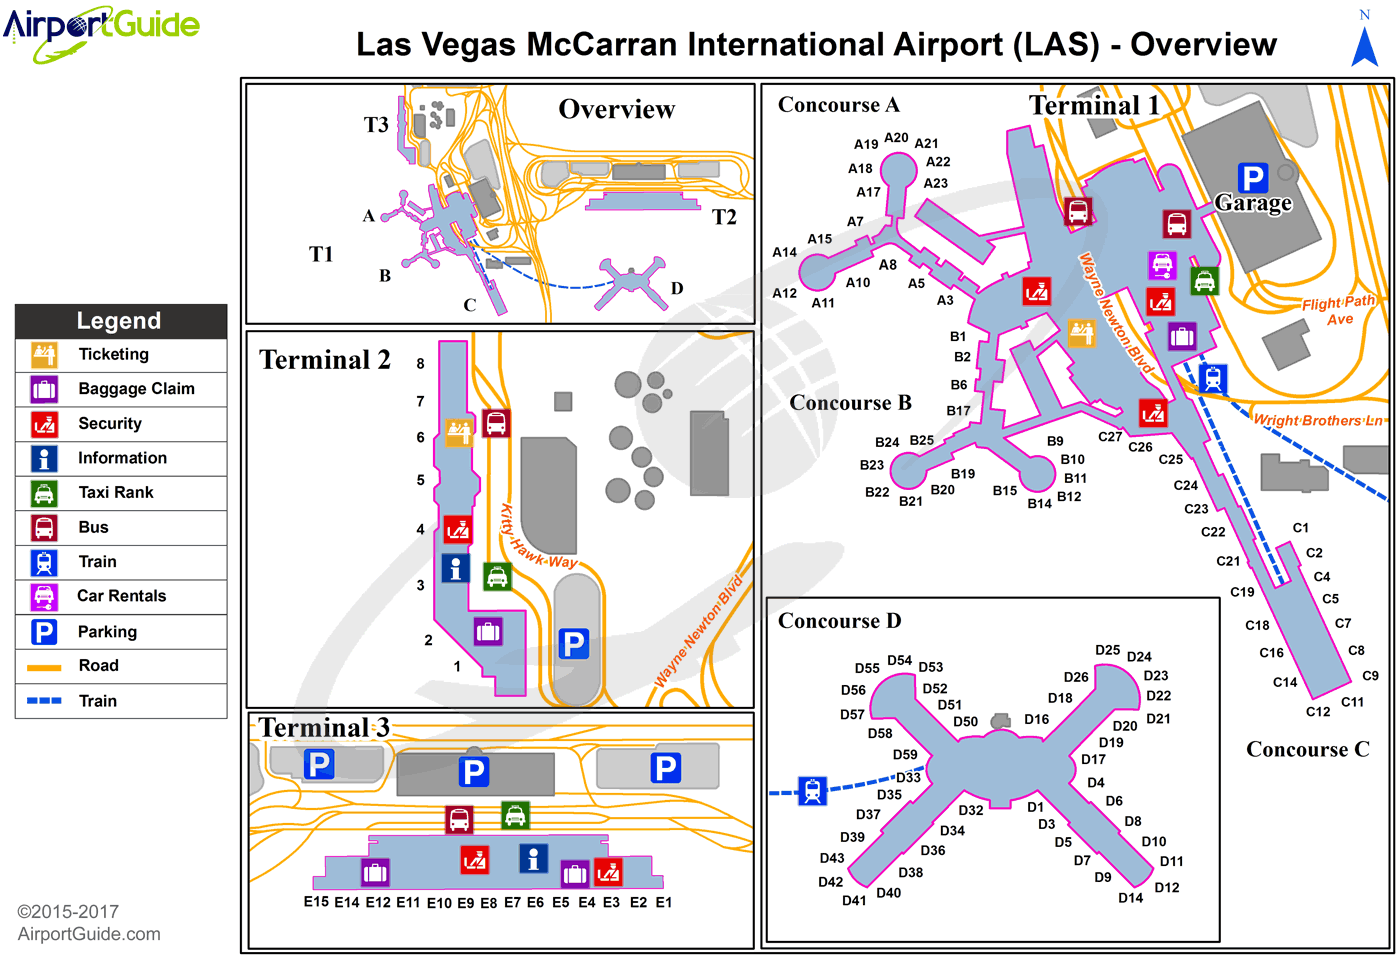 Las Vegas Mc Carran International Las Airport Terminal Map Overview Airport Guide Airport Map